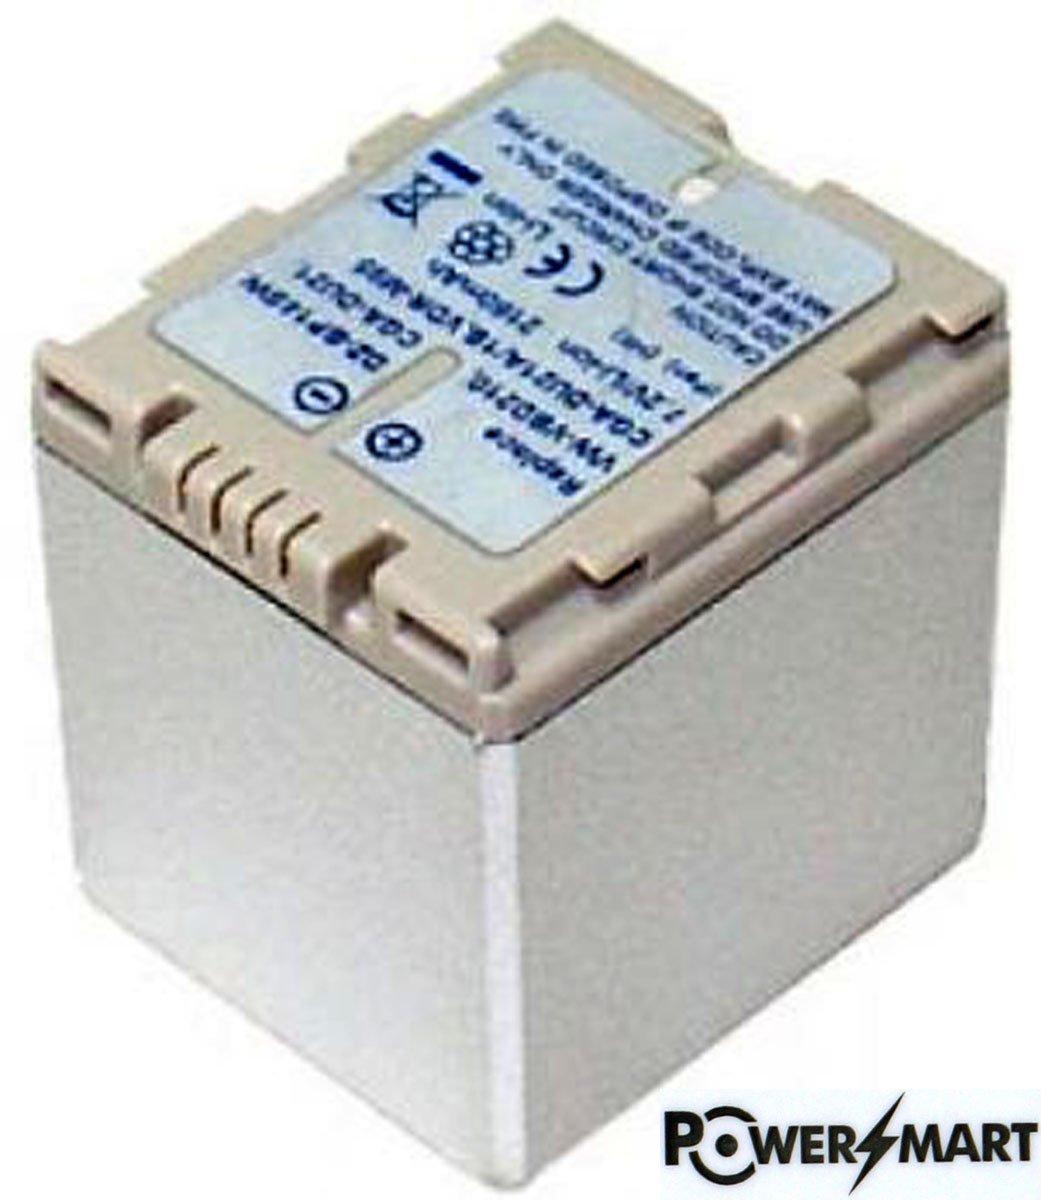 PowerSmart® 7.2V 2160mAh Li-ion Battery for PANASONIC NV-MX500A PV-GS120 PV-GS150 PV-GS180 PV-GS19 PV-GS200 PV-GS250 PV-GS29 PV-GS300 PV-GS31 PV-GS320 PV-GS33 PV-GS34 PV-GS35 PV-GS36 PV-GS39 PV-GS400 PV-GS50 PV-GS500 PV-GS50K PV-GS50S